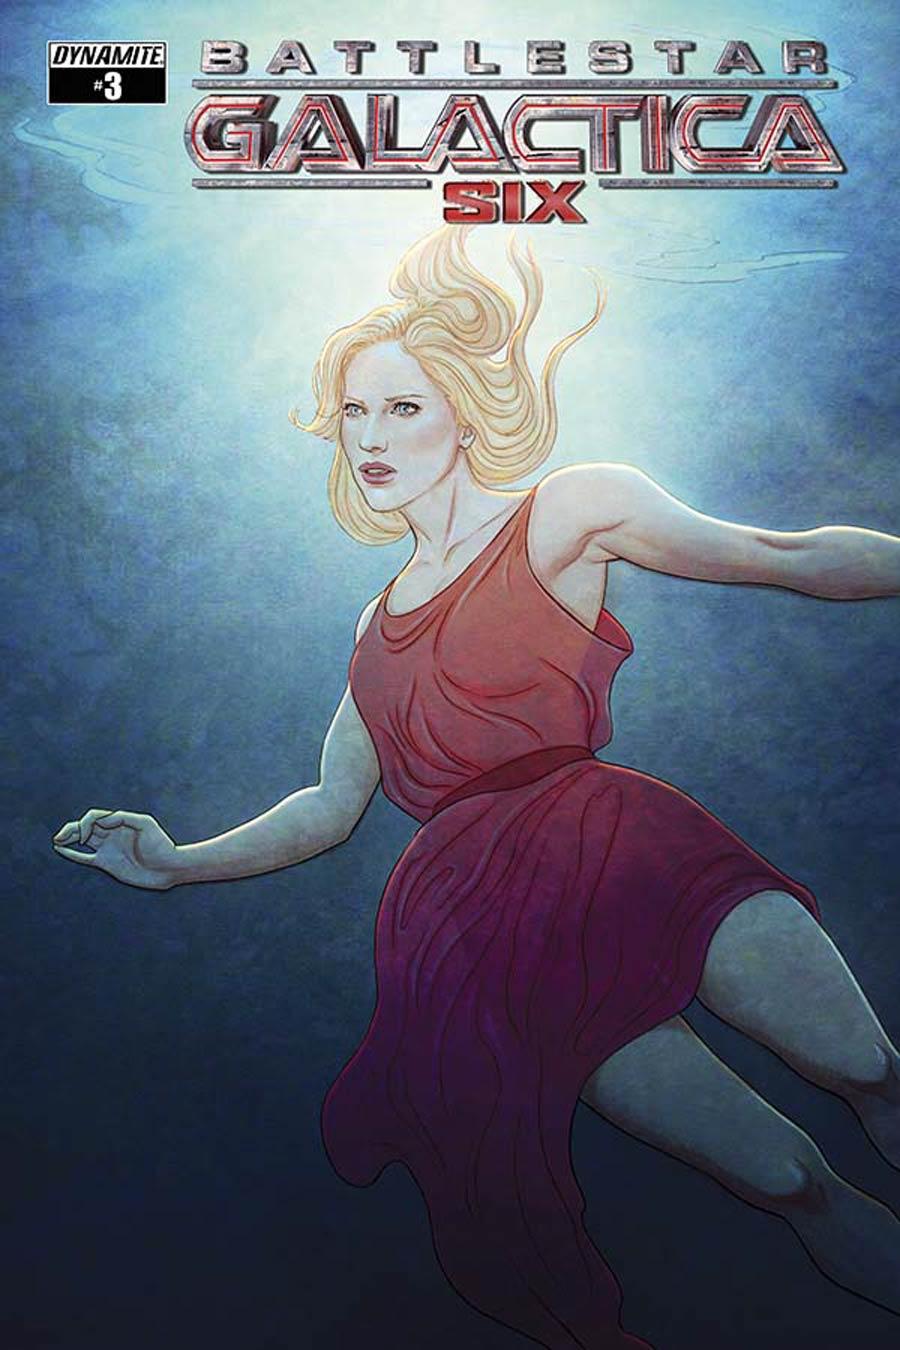 Battlestar Galactica Six #3 Cover A Regular Jenny Frison Cover